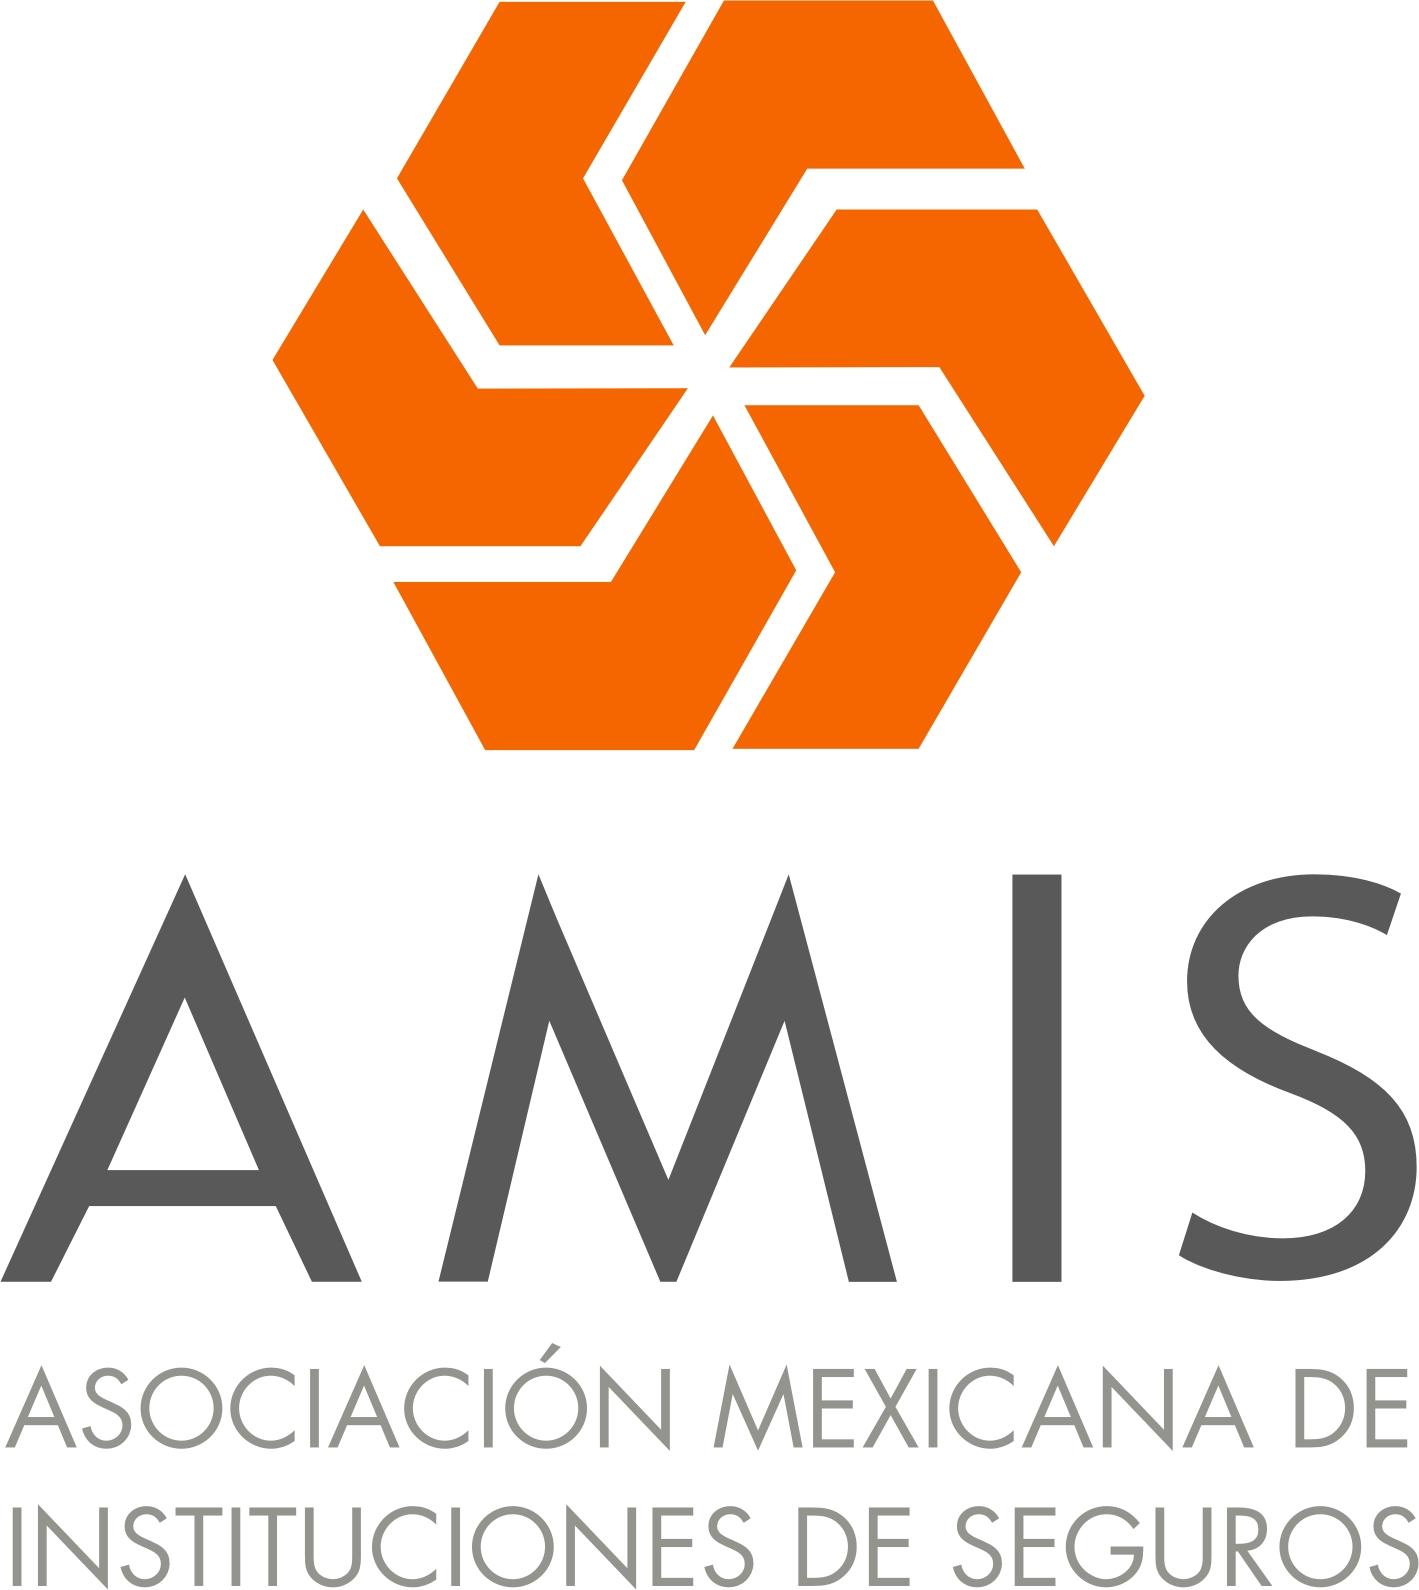 AMIS Logo photo - 1